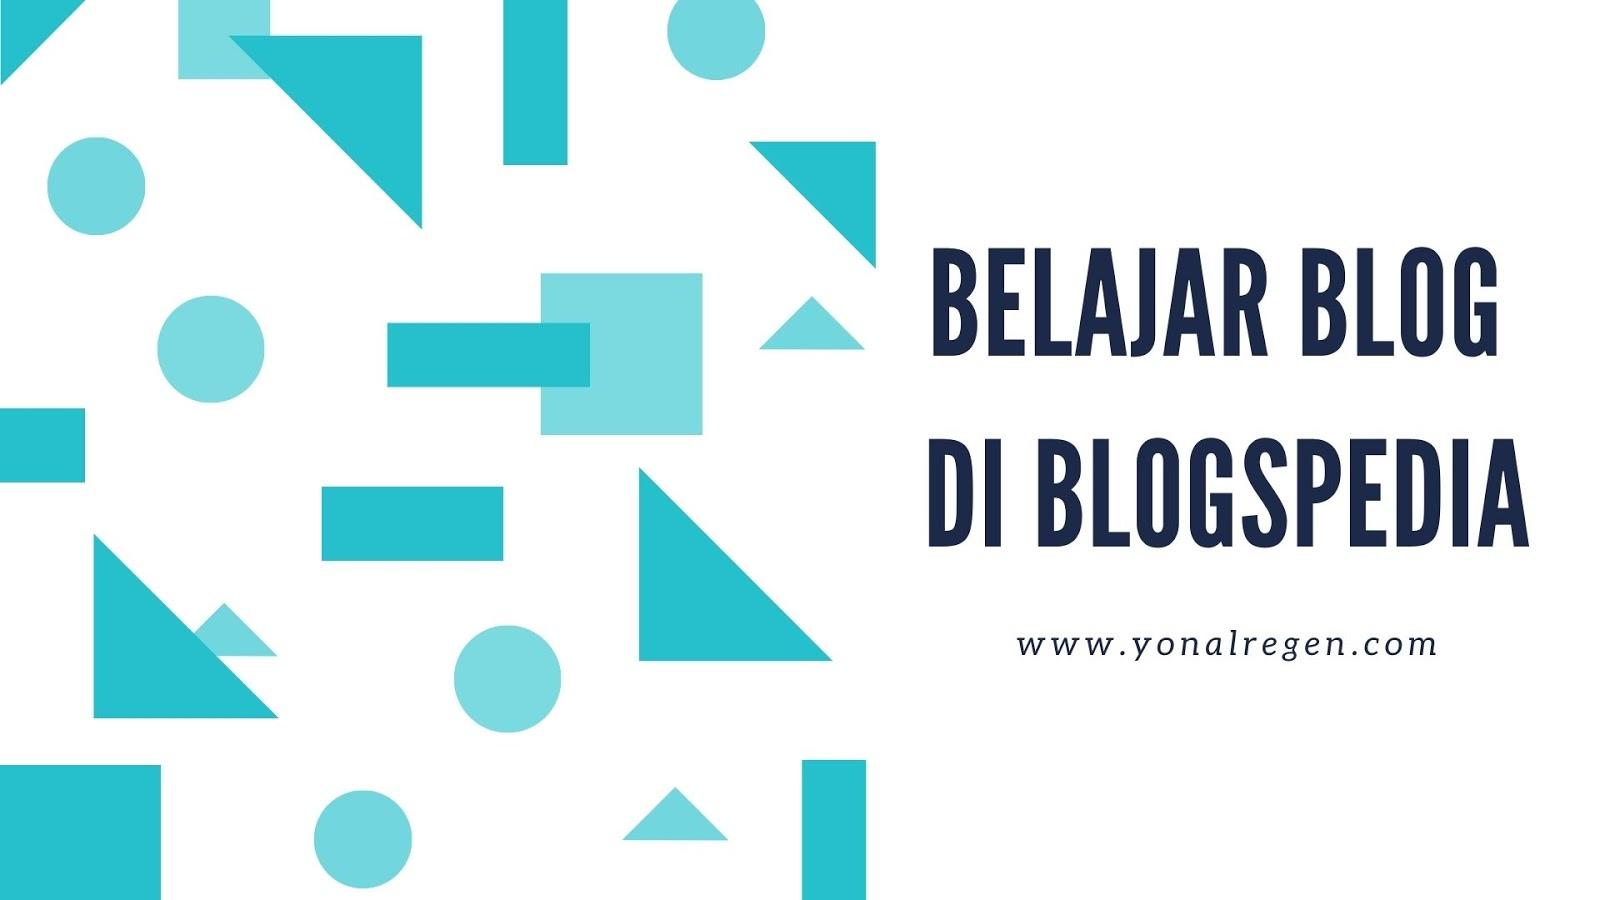 belajar blog di blogspedia